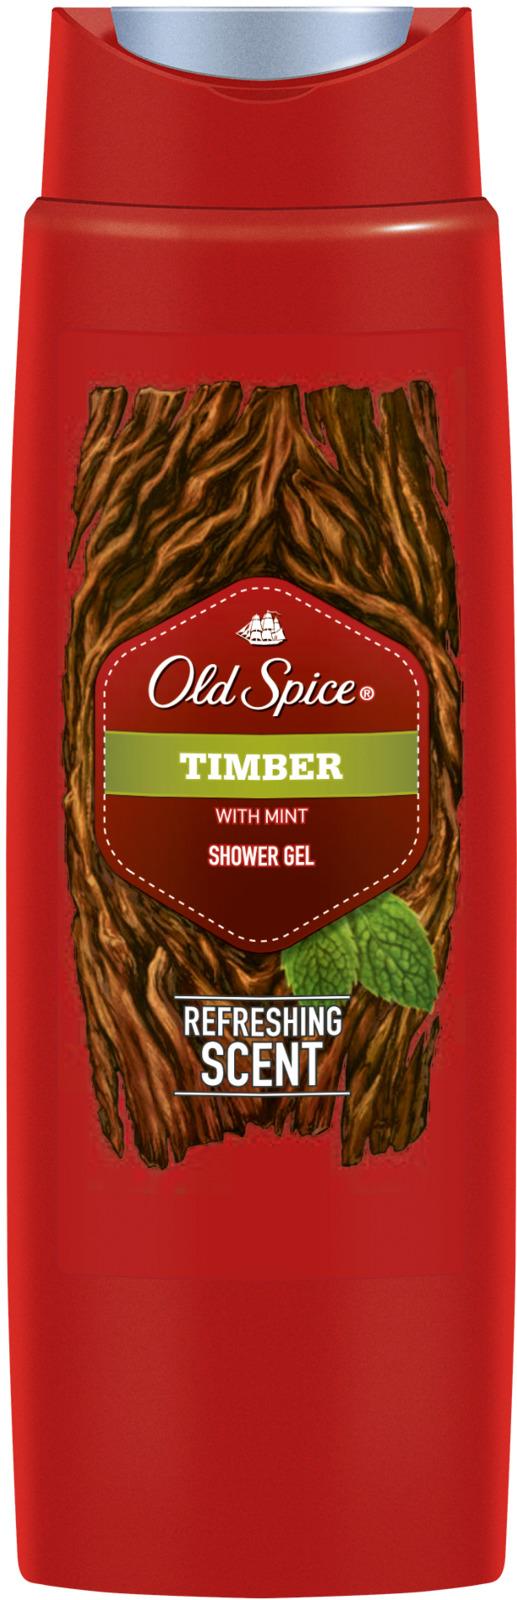 Гель для душа Old Spice Timber, 250 мл